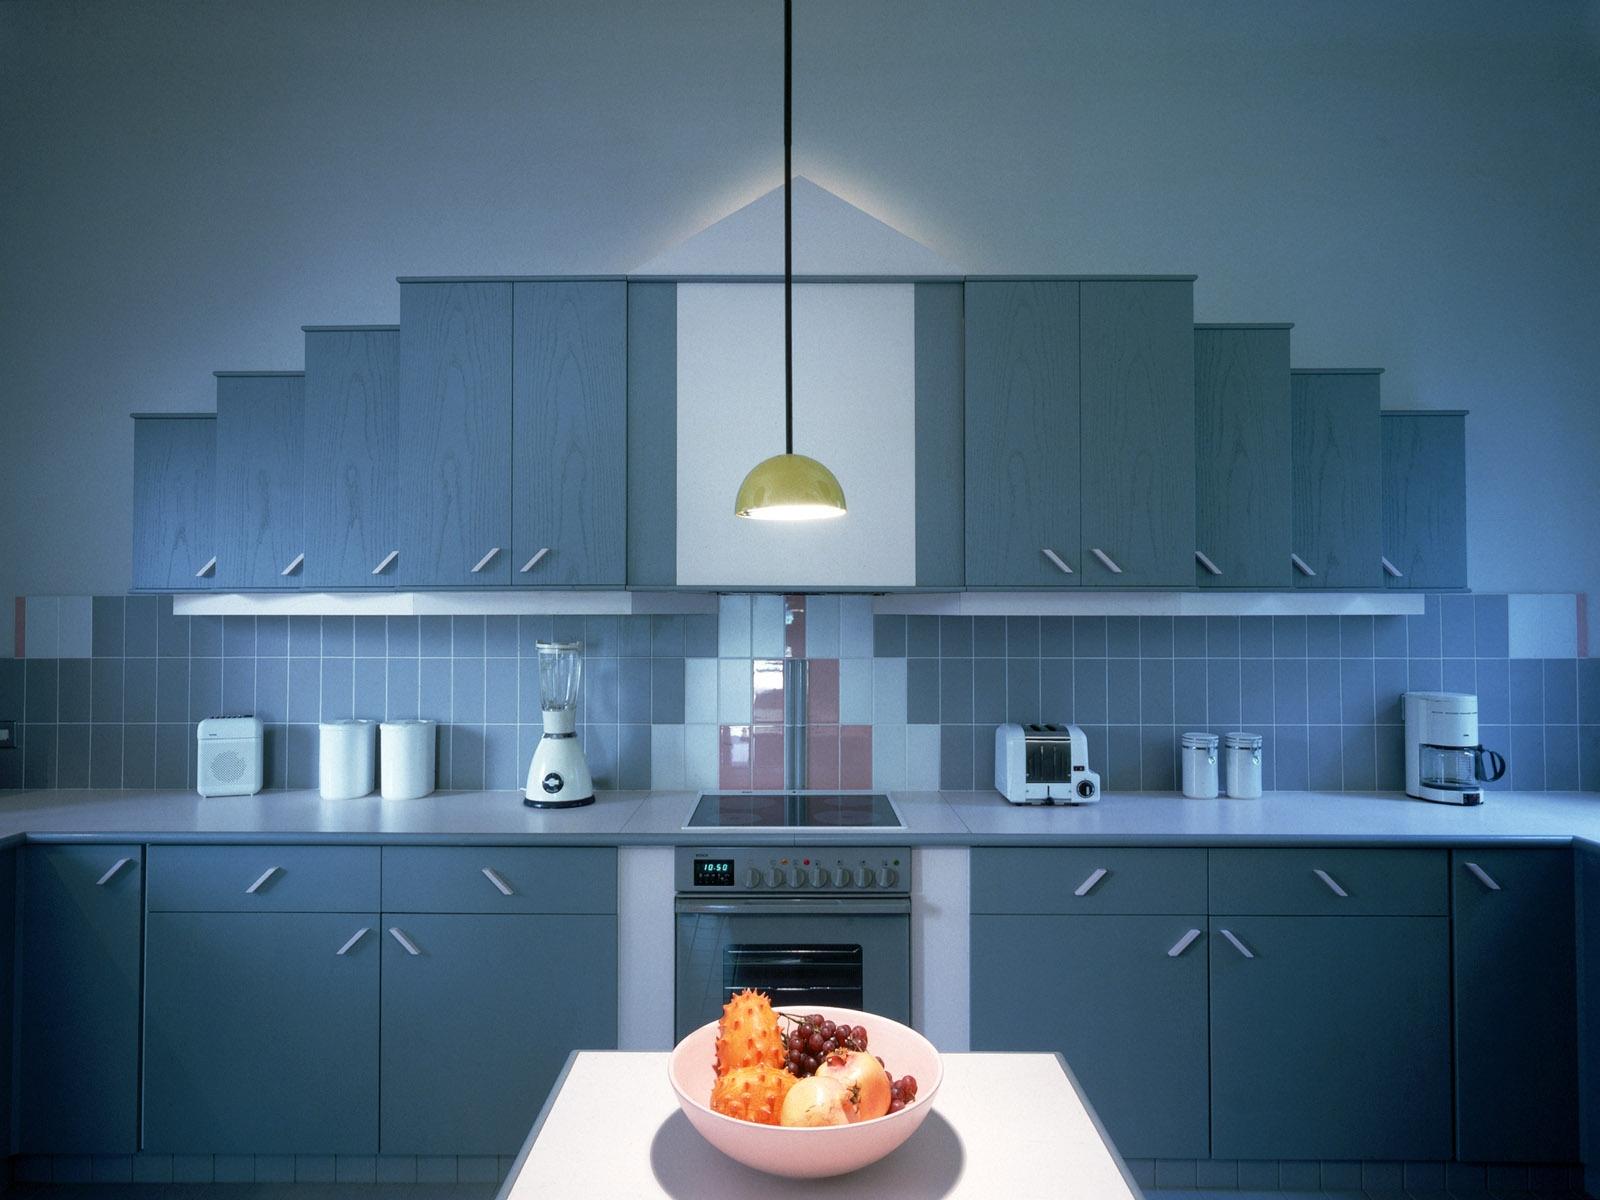 Wallpaper : food, room, table, kitchen, shelves, interior design ...